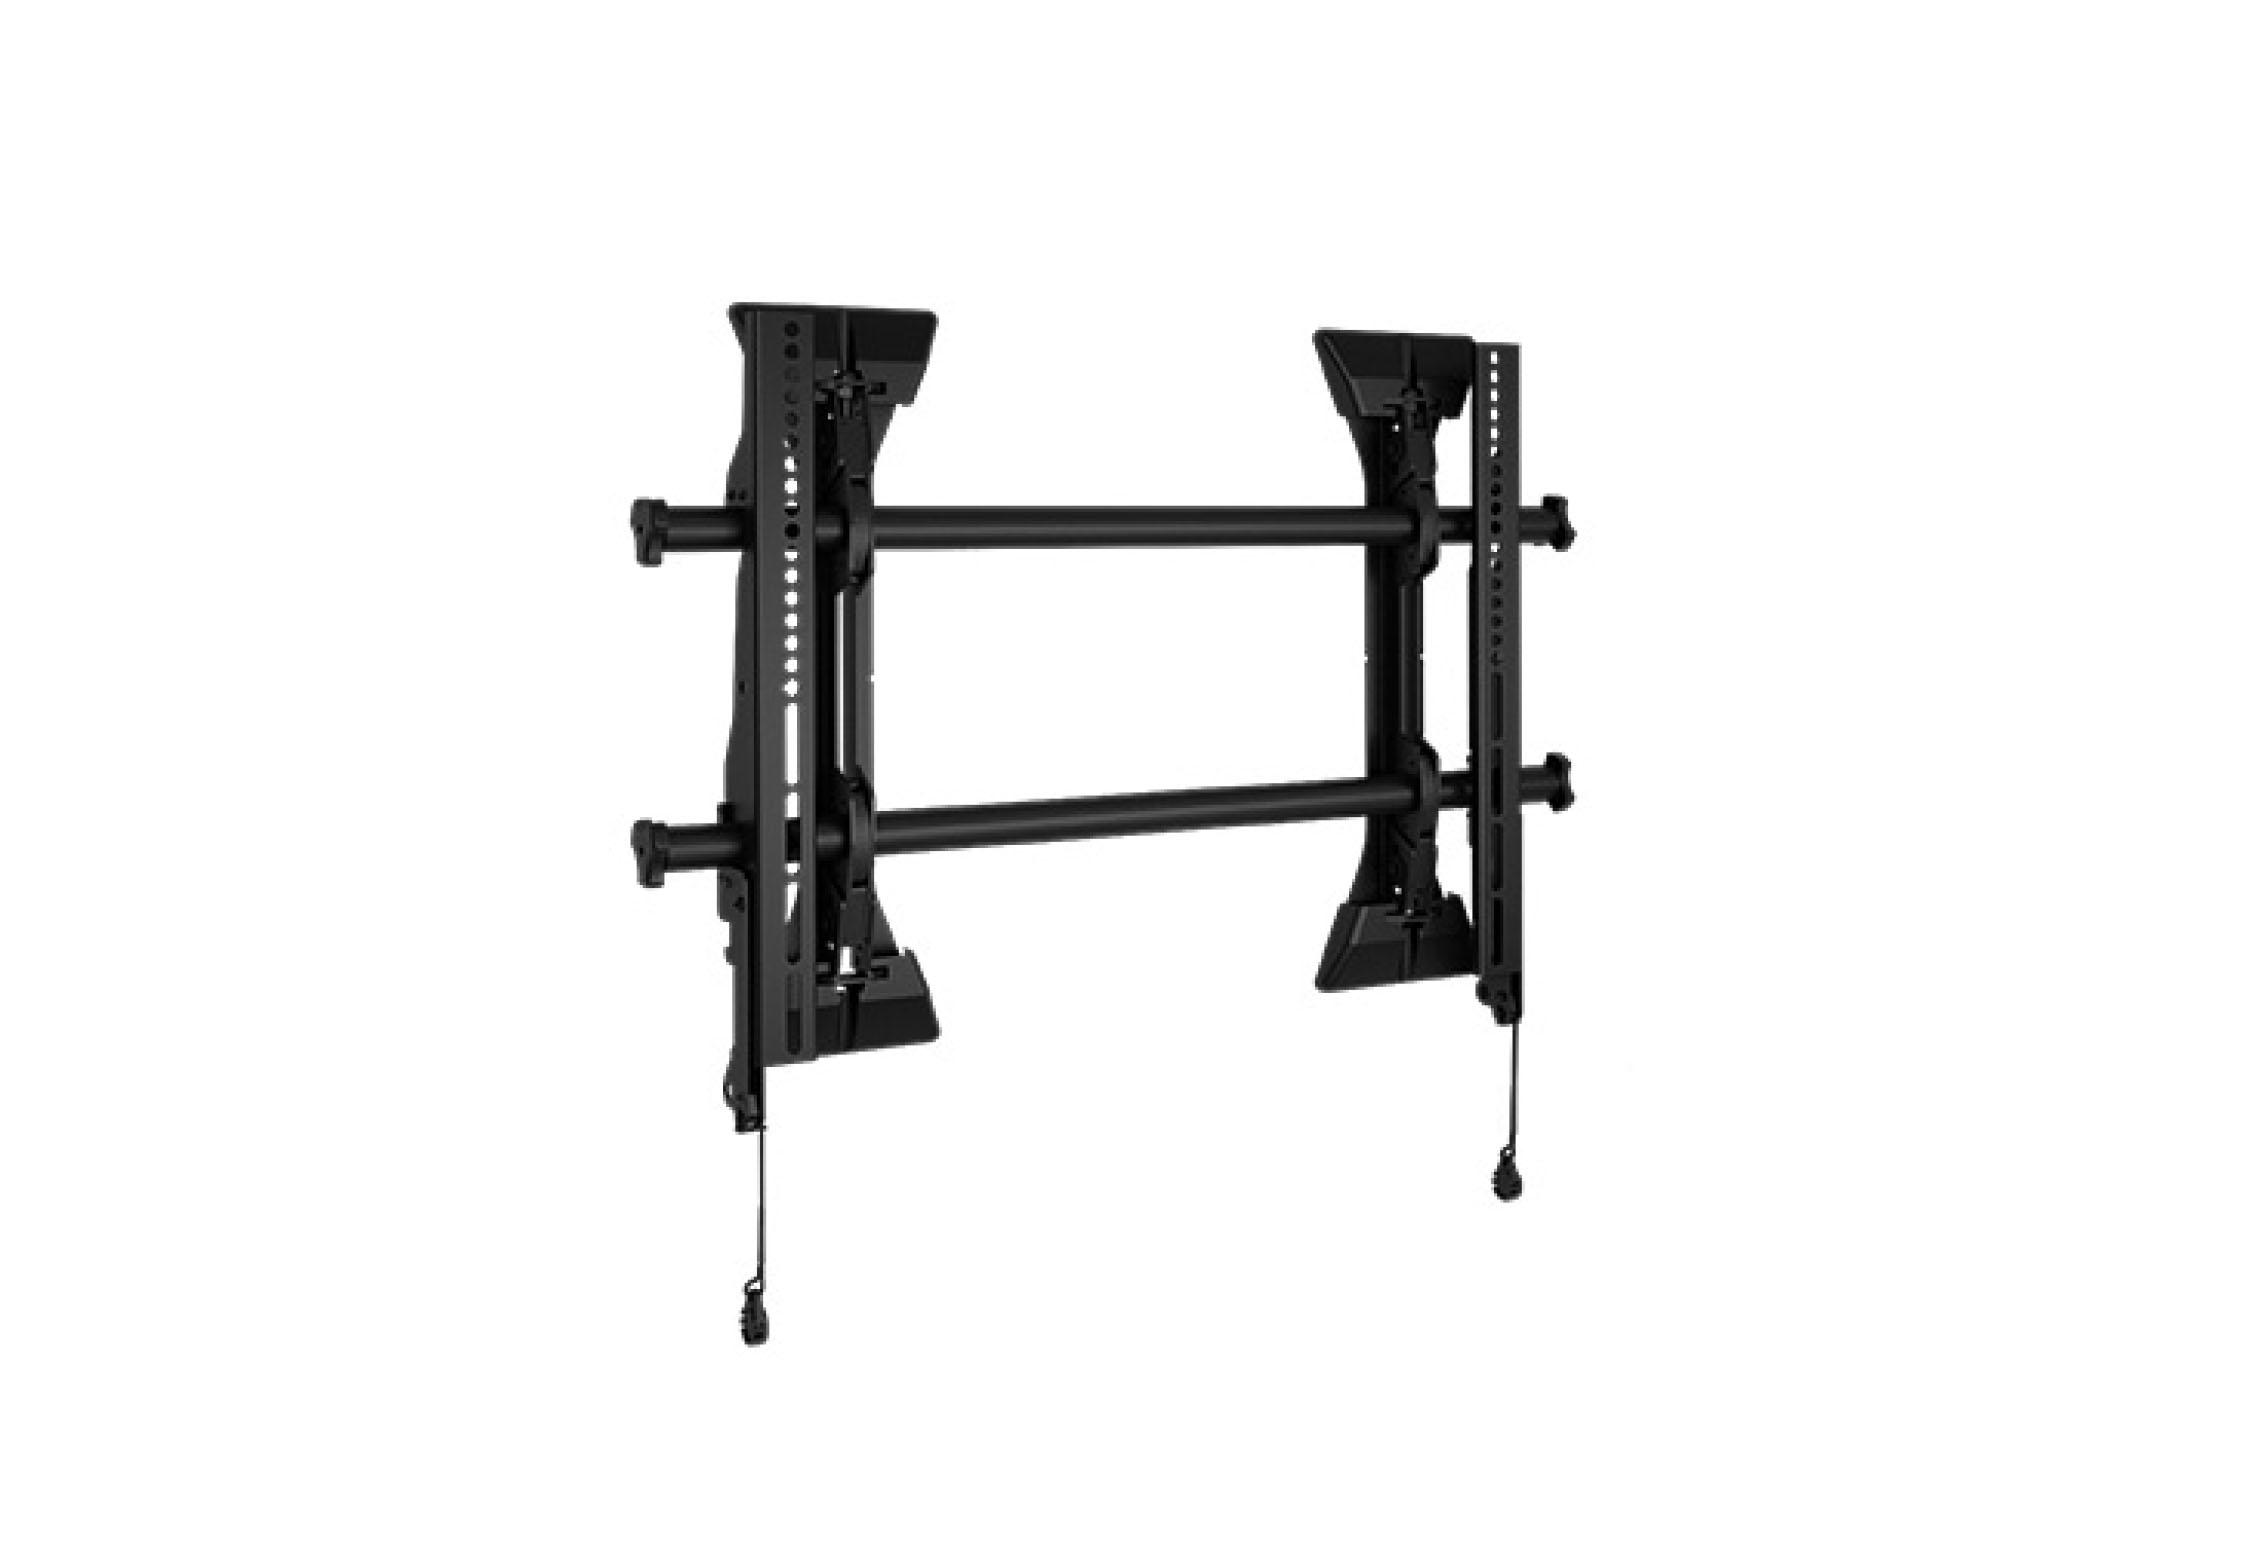 Support mural fixe 32``- 65`` Micro-adjustable - Vesa 100x100 - 650x400 mm. Charge maxi 57 kg.